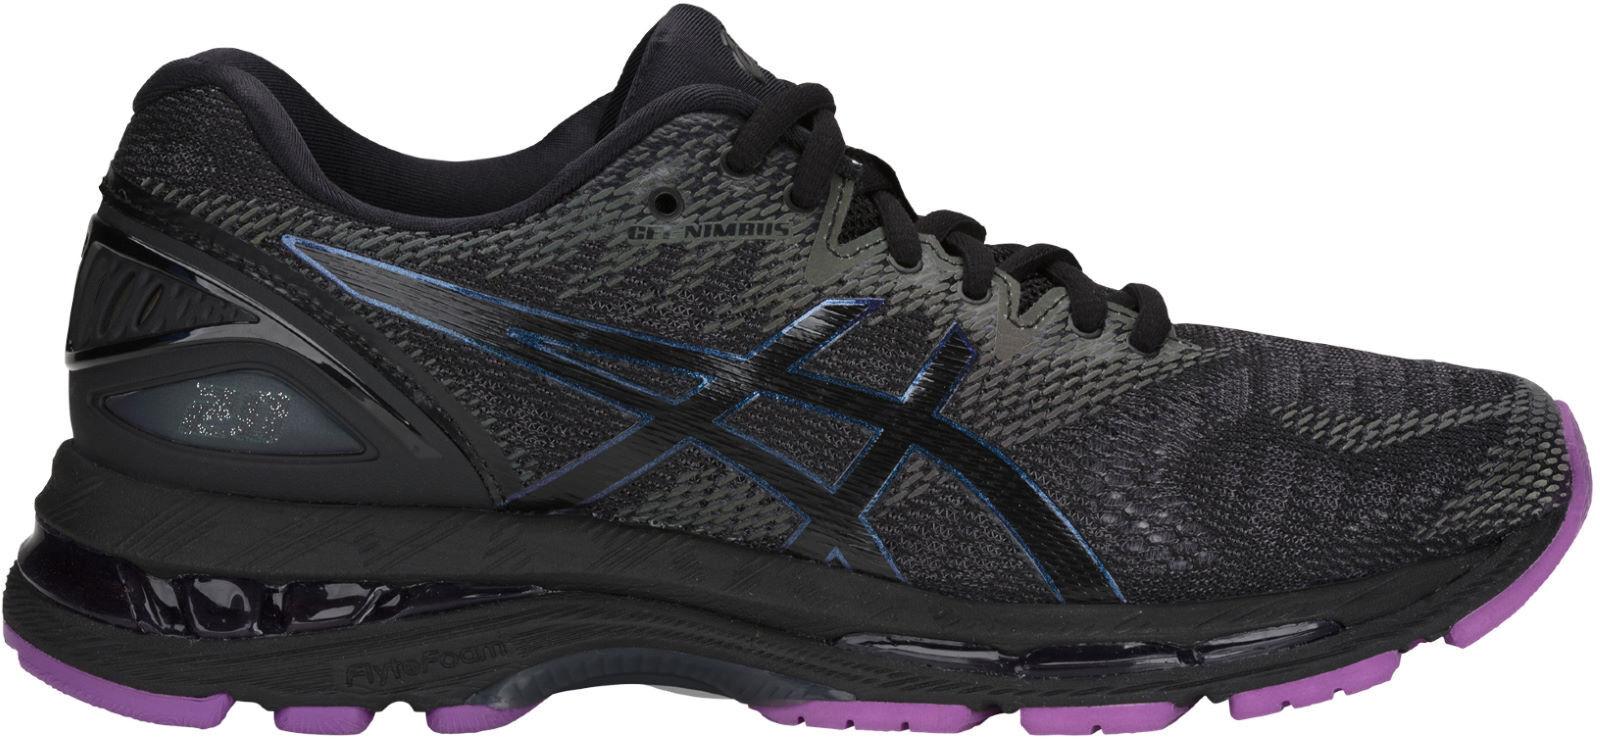 Asics Gel Nimbus 20 Lite Show Womens Running shoes - Black